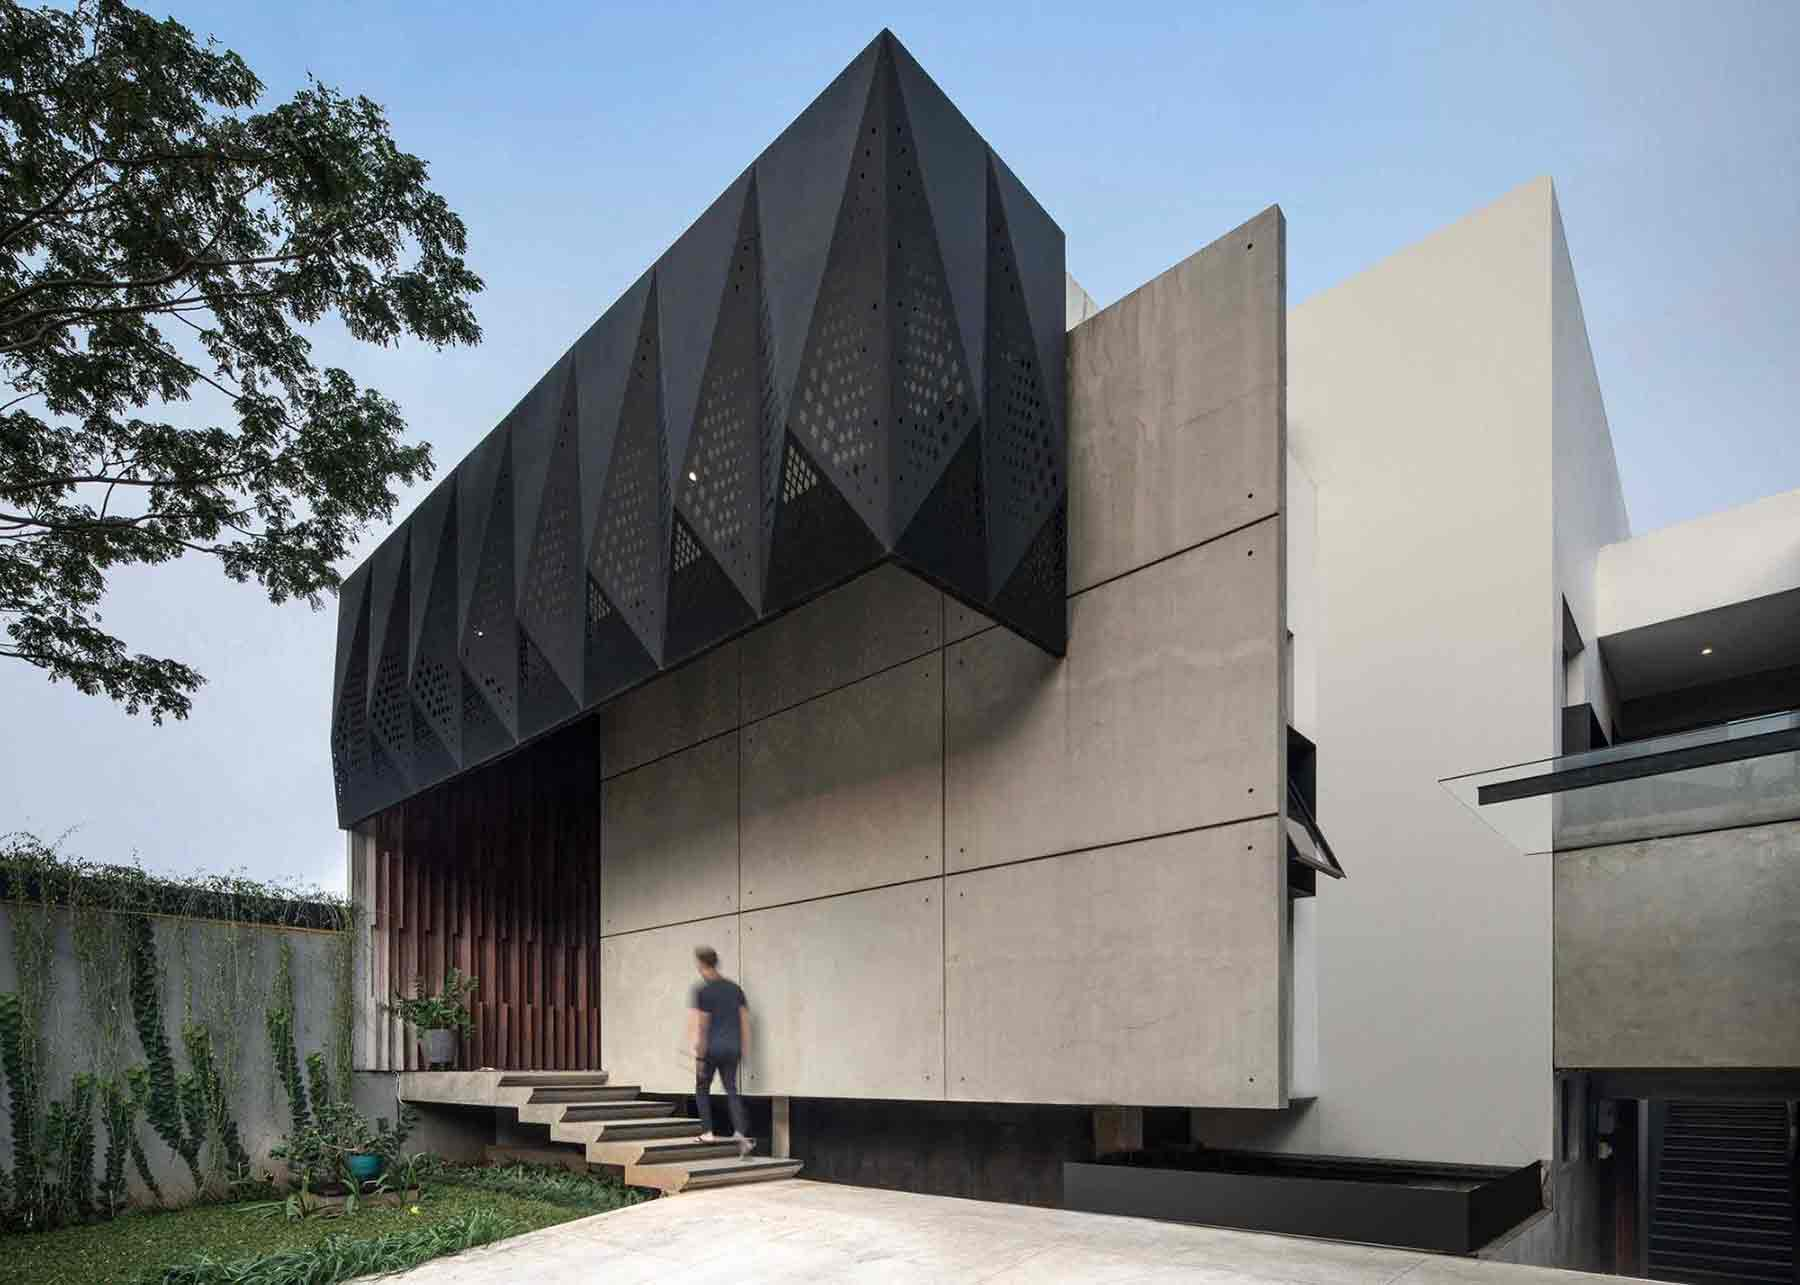 Pola geometris pada atap teras rumah, viaarsitag.com